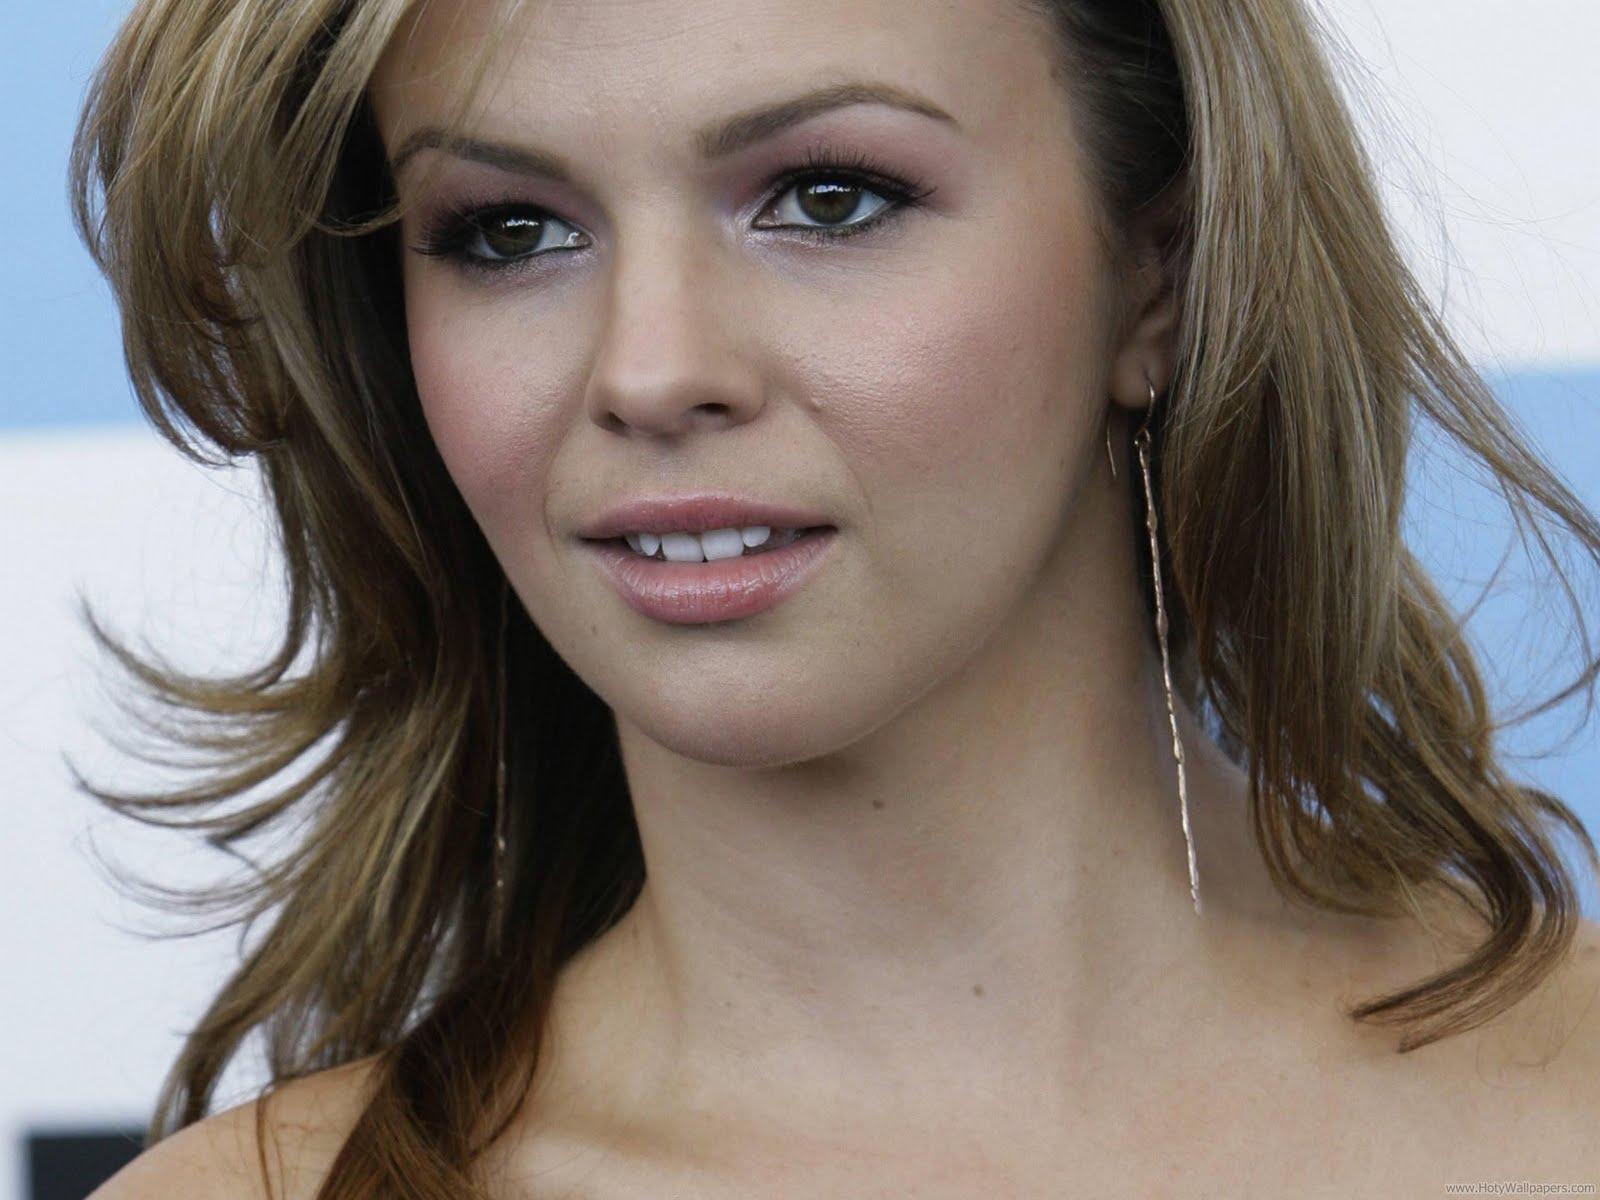 http://4.bp.blogspot.com/-mVYq0f8pVtg/Tvx94lp7P6I/AAAAAAAABoI/HCUKOSfhtko/s1600/pretty_amber_tamblyn_wallpaper.jpg